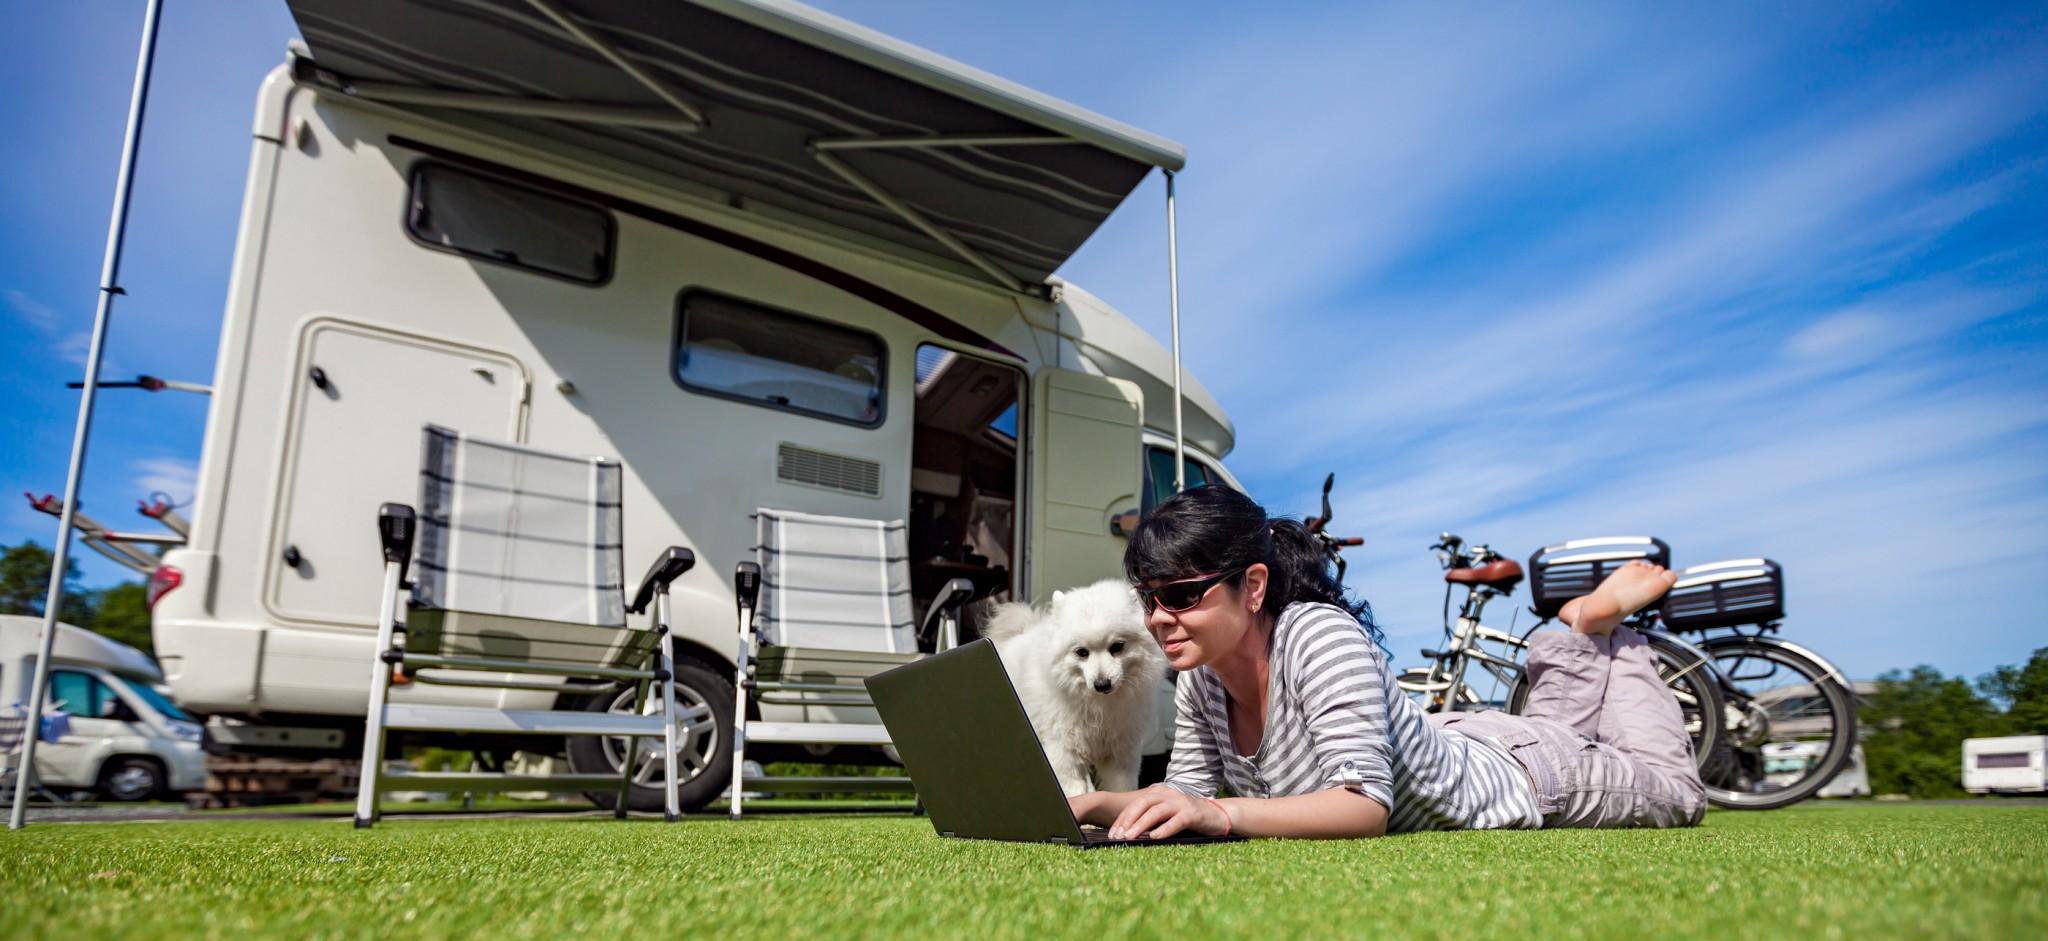 %e2%80%8f%e2%80%8fbigstock-woman-on-the-grass-with-a-dog-144562691-%d7%a2%d7%95%d7%aa%d7%a7